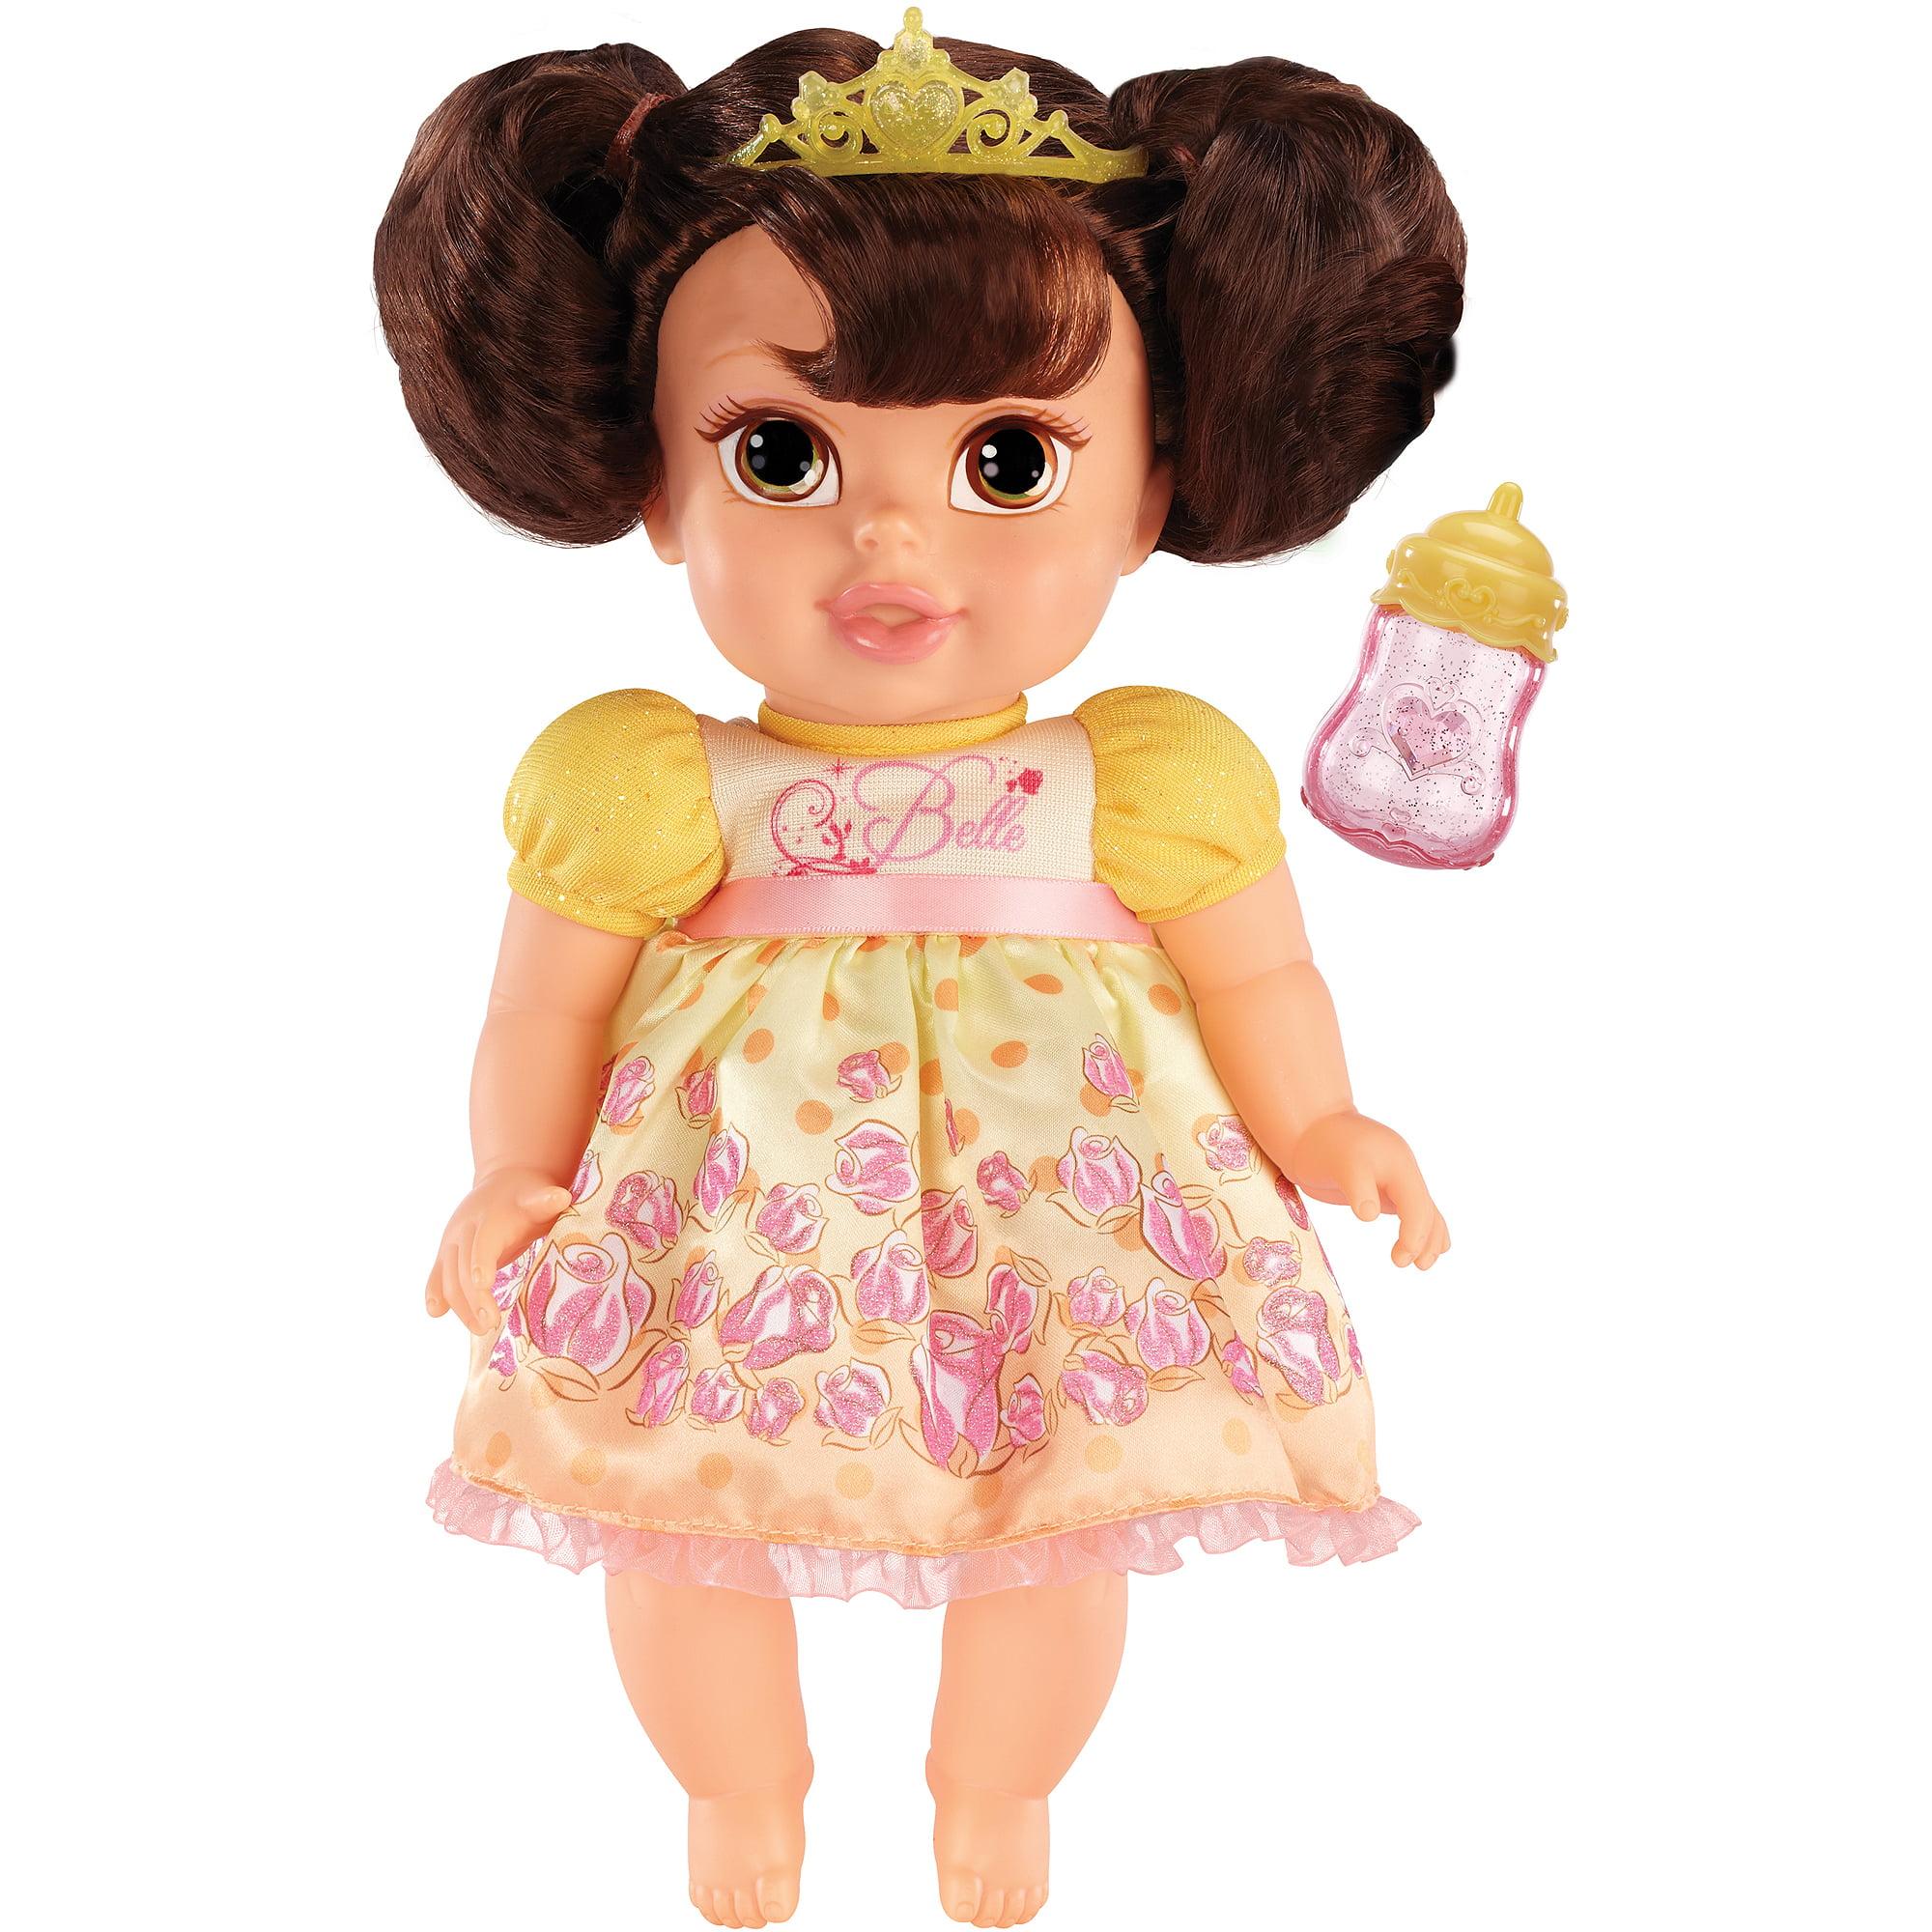 Amazon Com Disney Princess Baby Belle Doll Toys Games: Disney Princess Deluxe Baby Doll, Belle